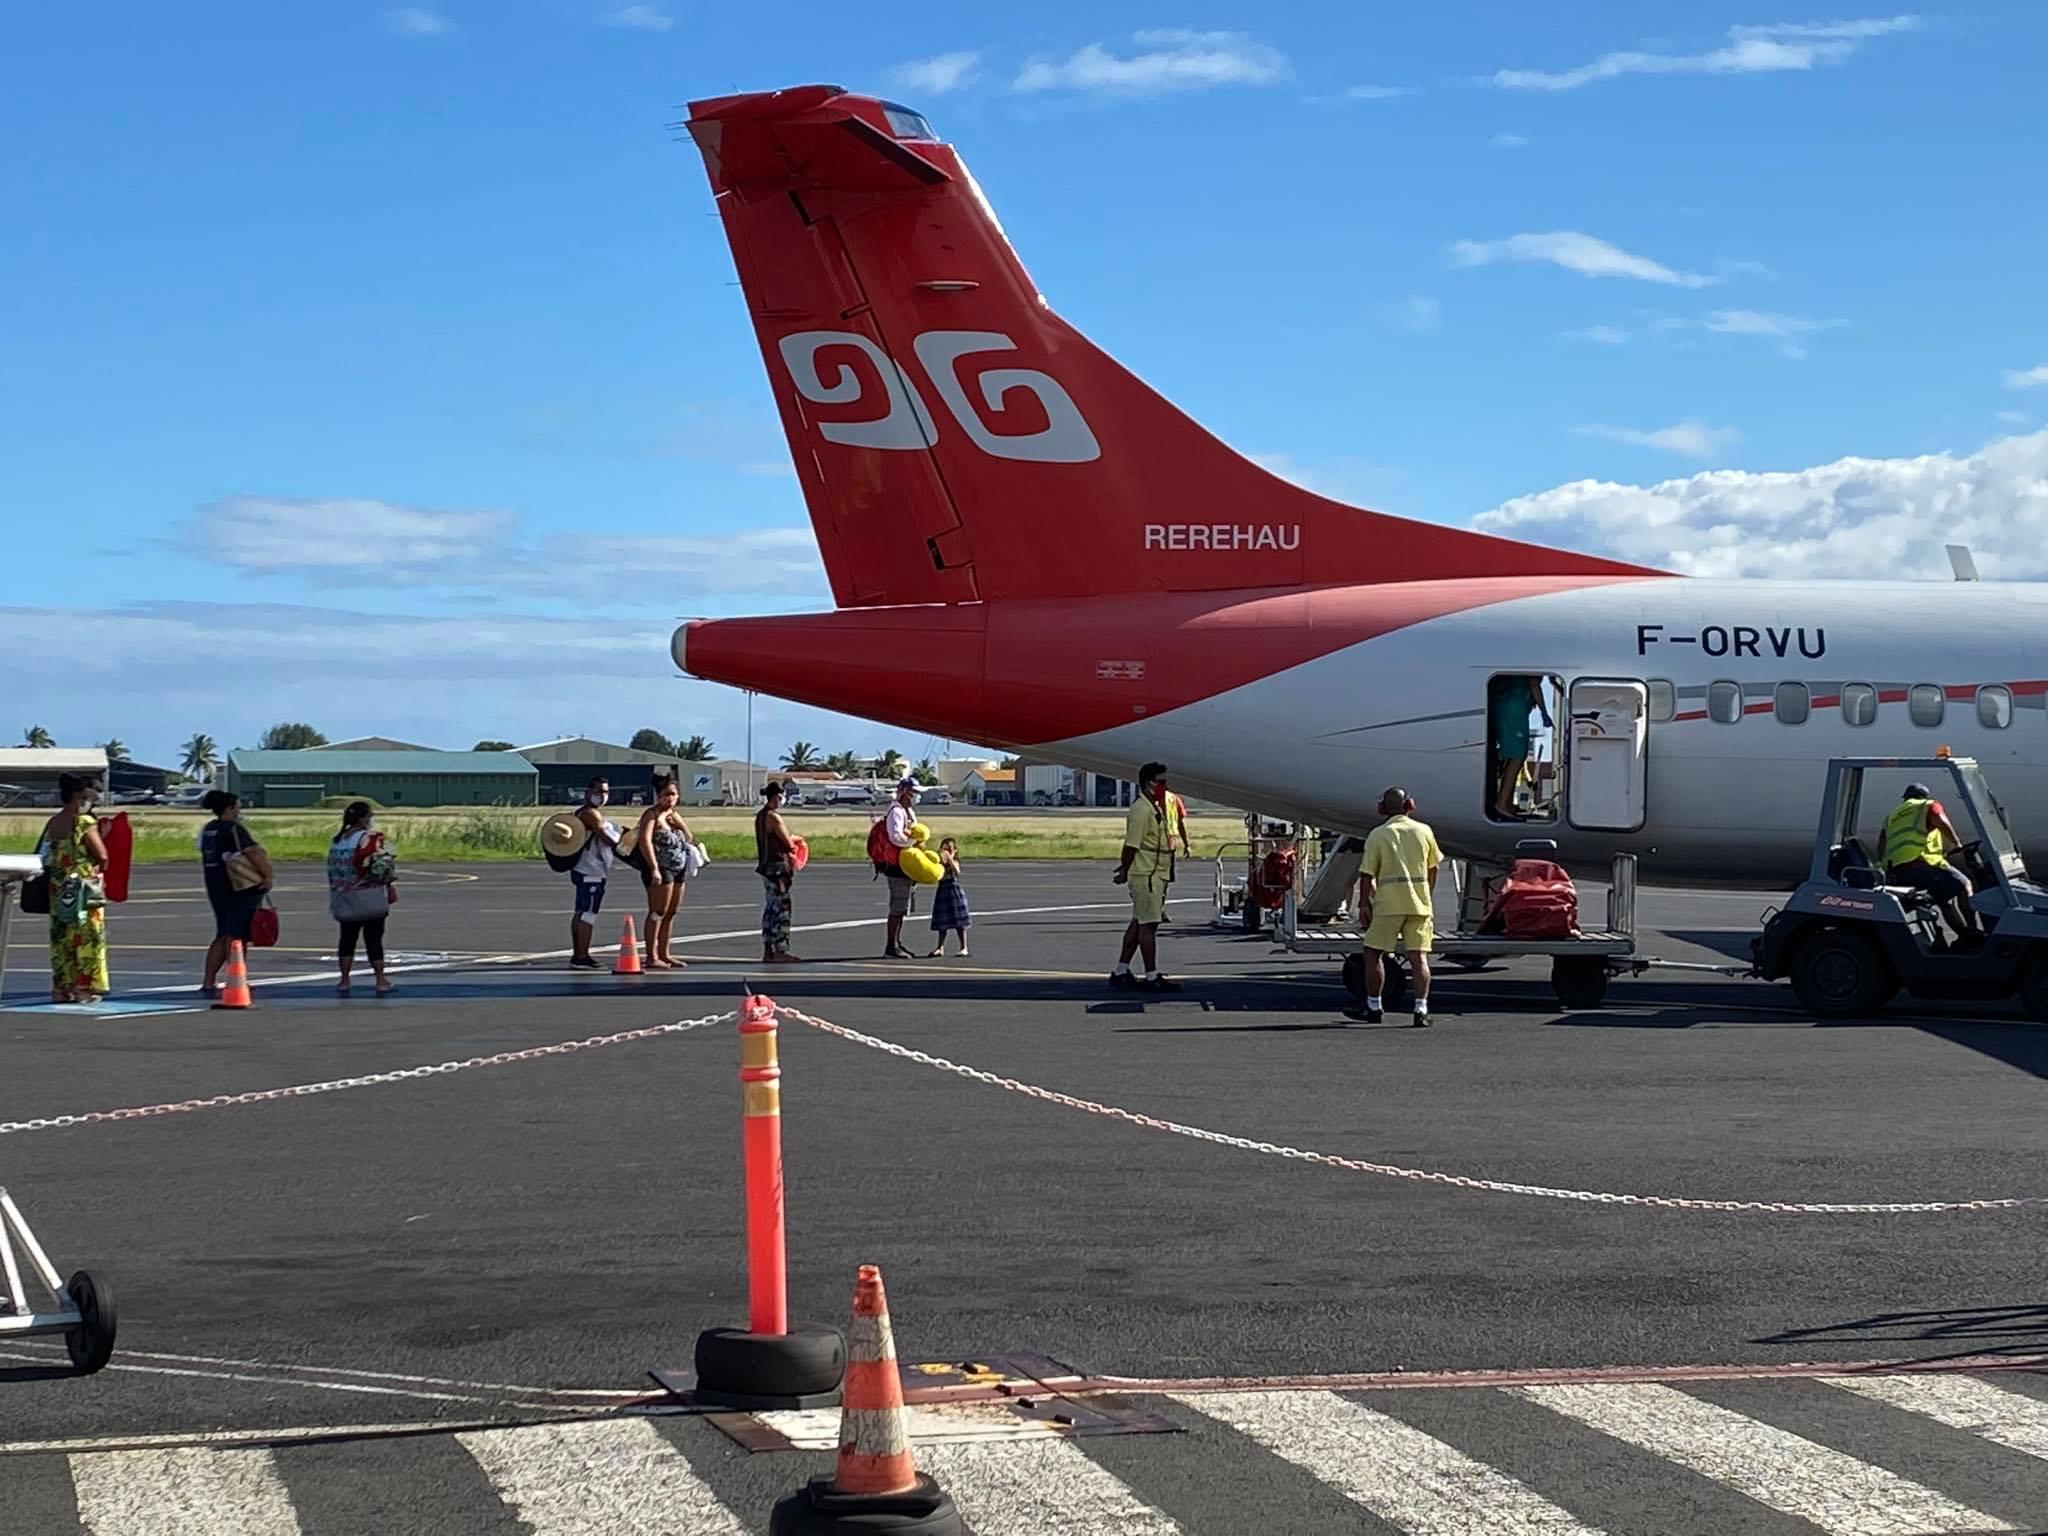 Pour le moment, dix destinations seront desservies, à savoir Raiatea, Bora Bora, Huahine, Rurutu, Tubuai, Nuku Hiva, Hiva Oa, Rangiroa, Fakarava et Tikehau.